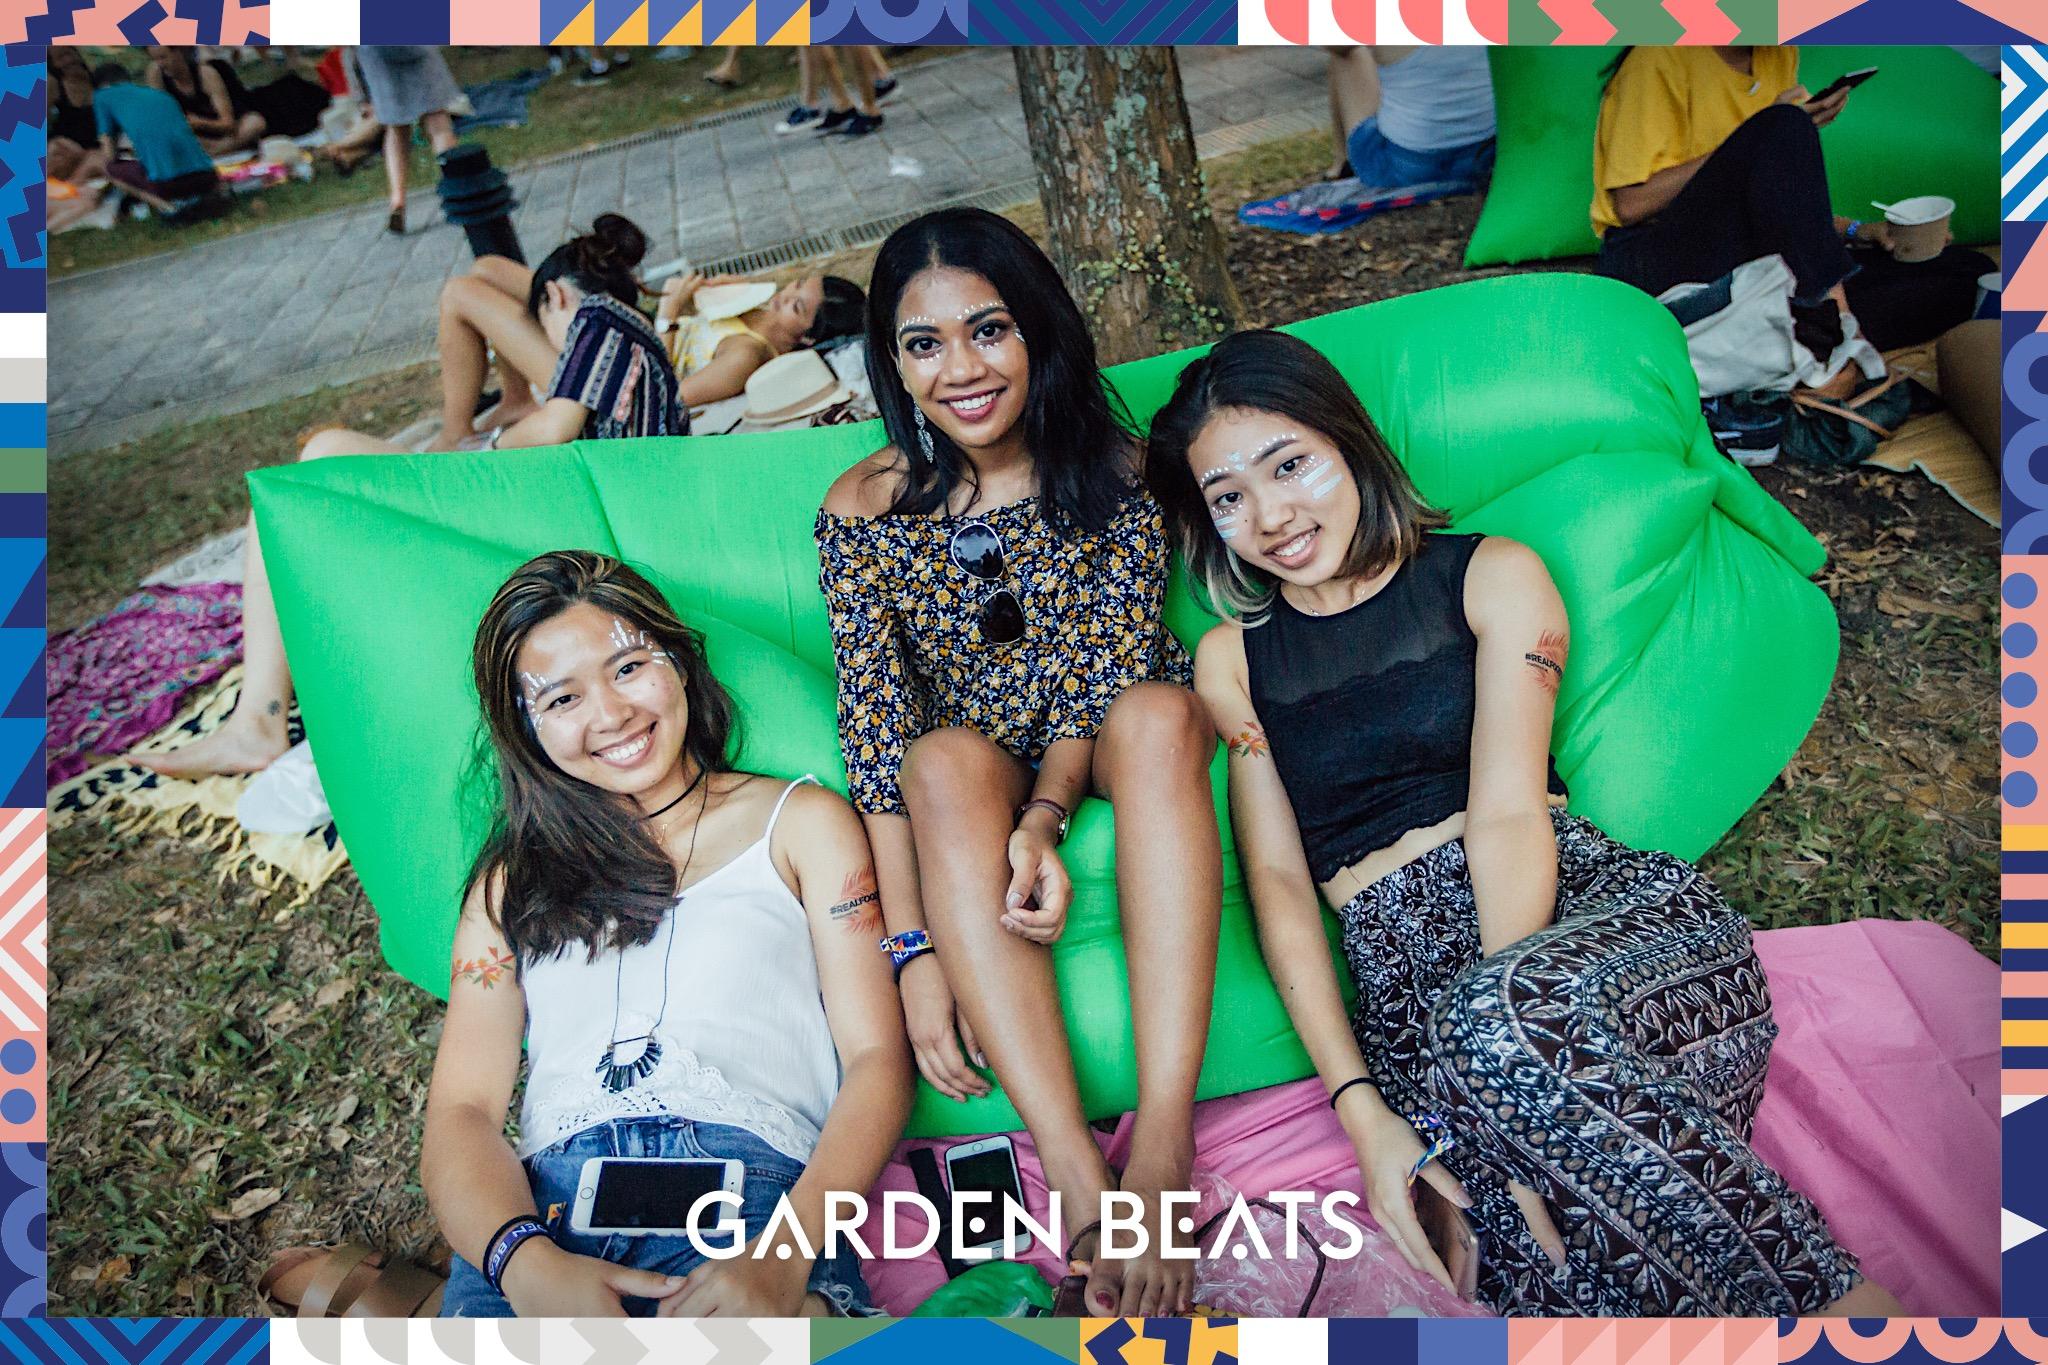 18032017_GardenBeats_Colossal695_WatermarkedGB.jpg